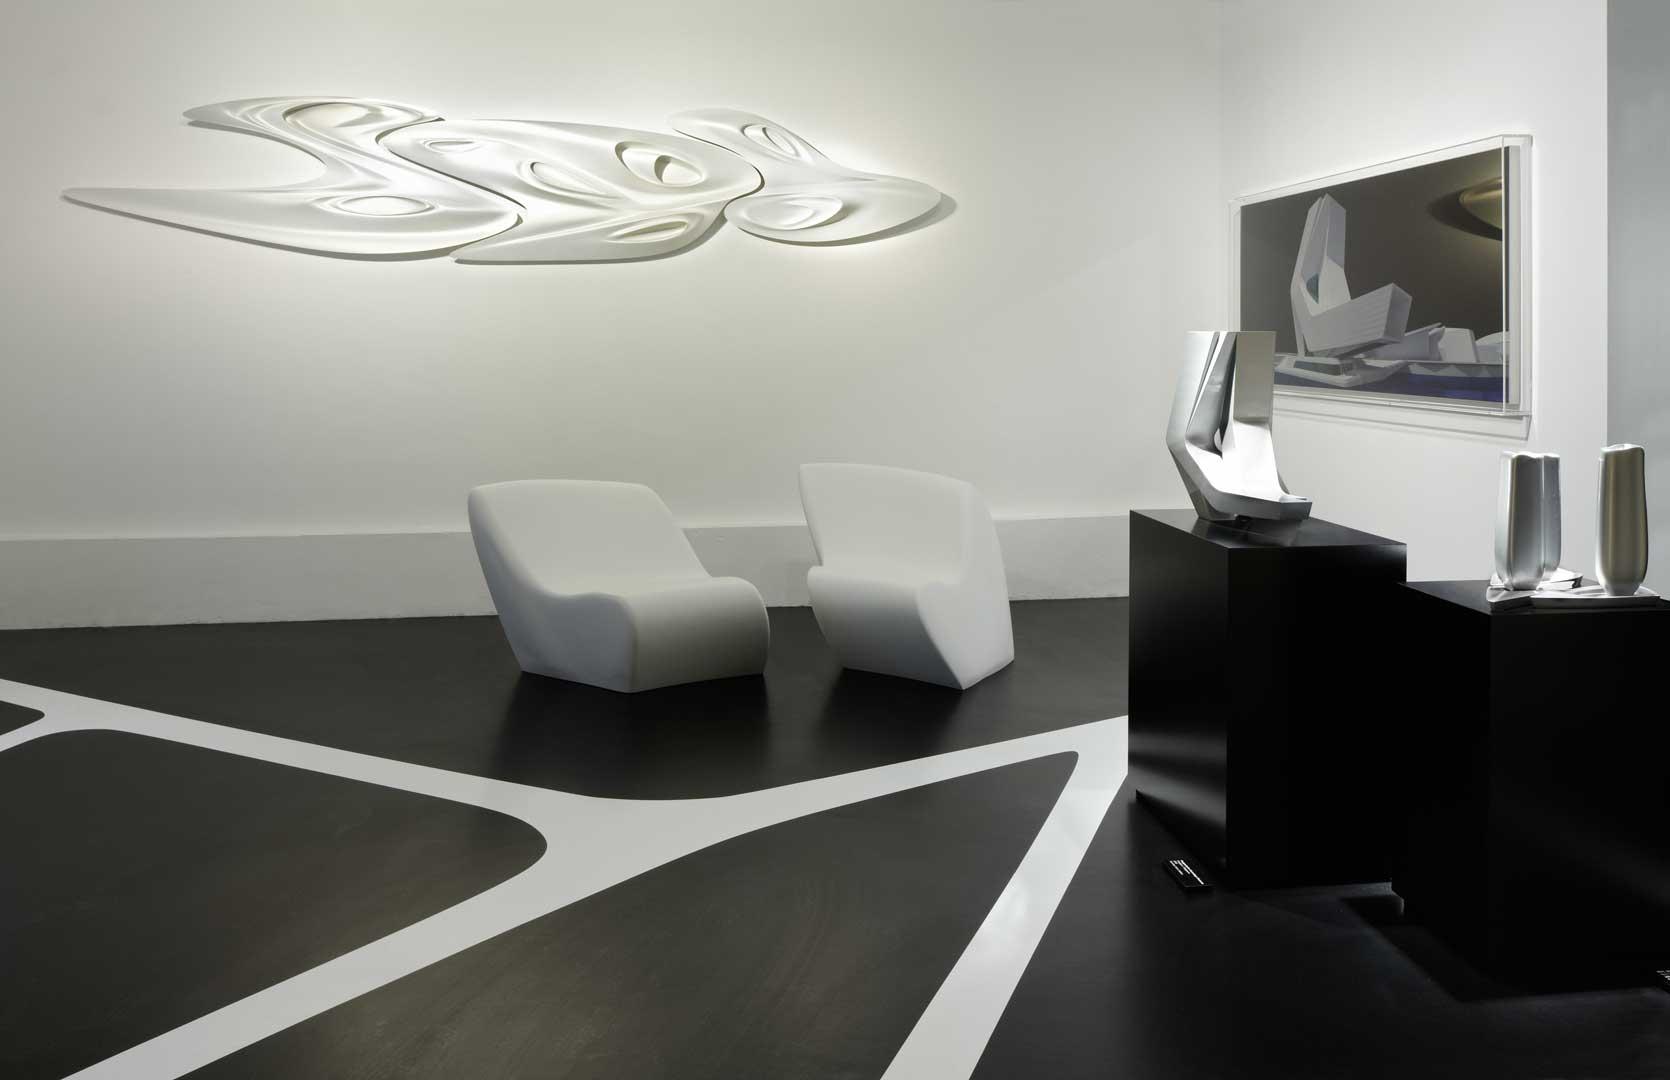 Galeriebild / Zaha Hadid Architects, Werkschau Parametric Tower Research im Rahmen des AIT-Salons